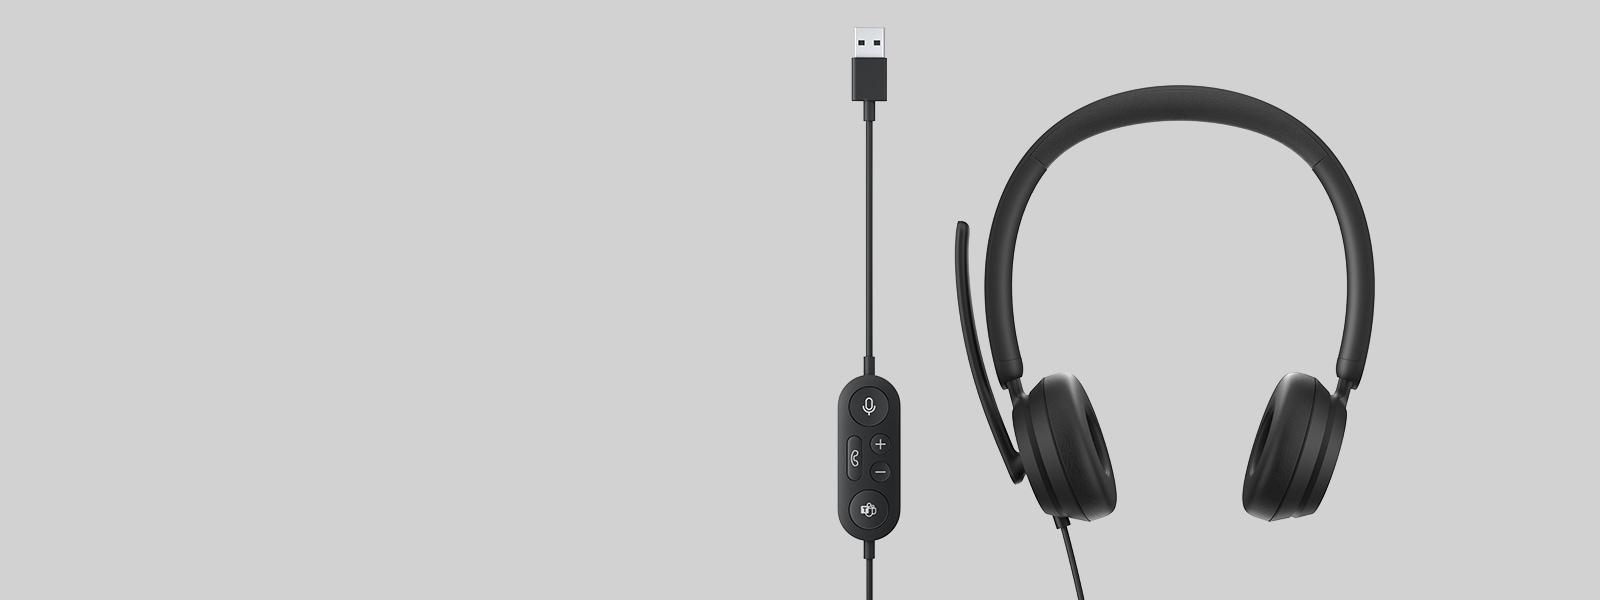 A Microsoft Modern USB Headset